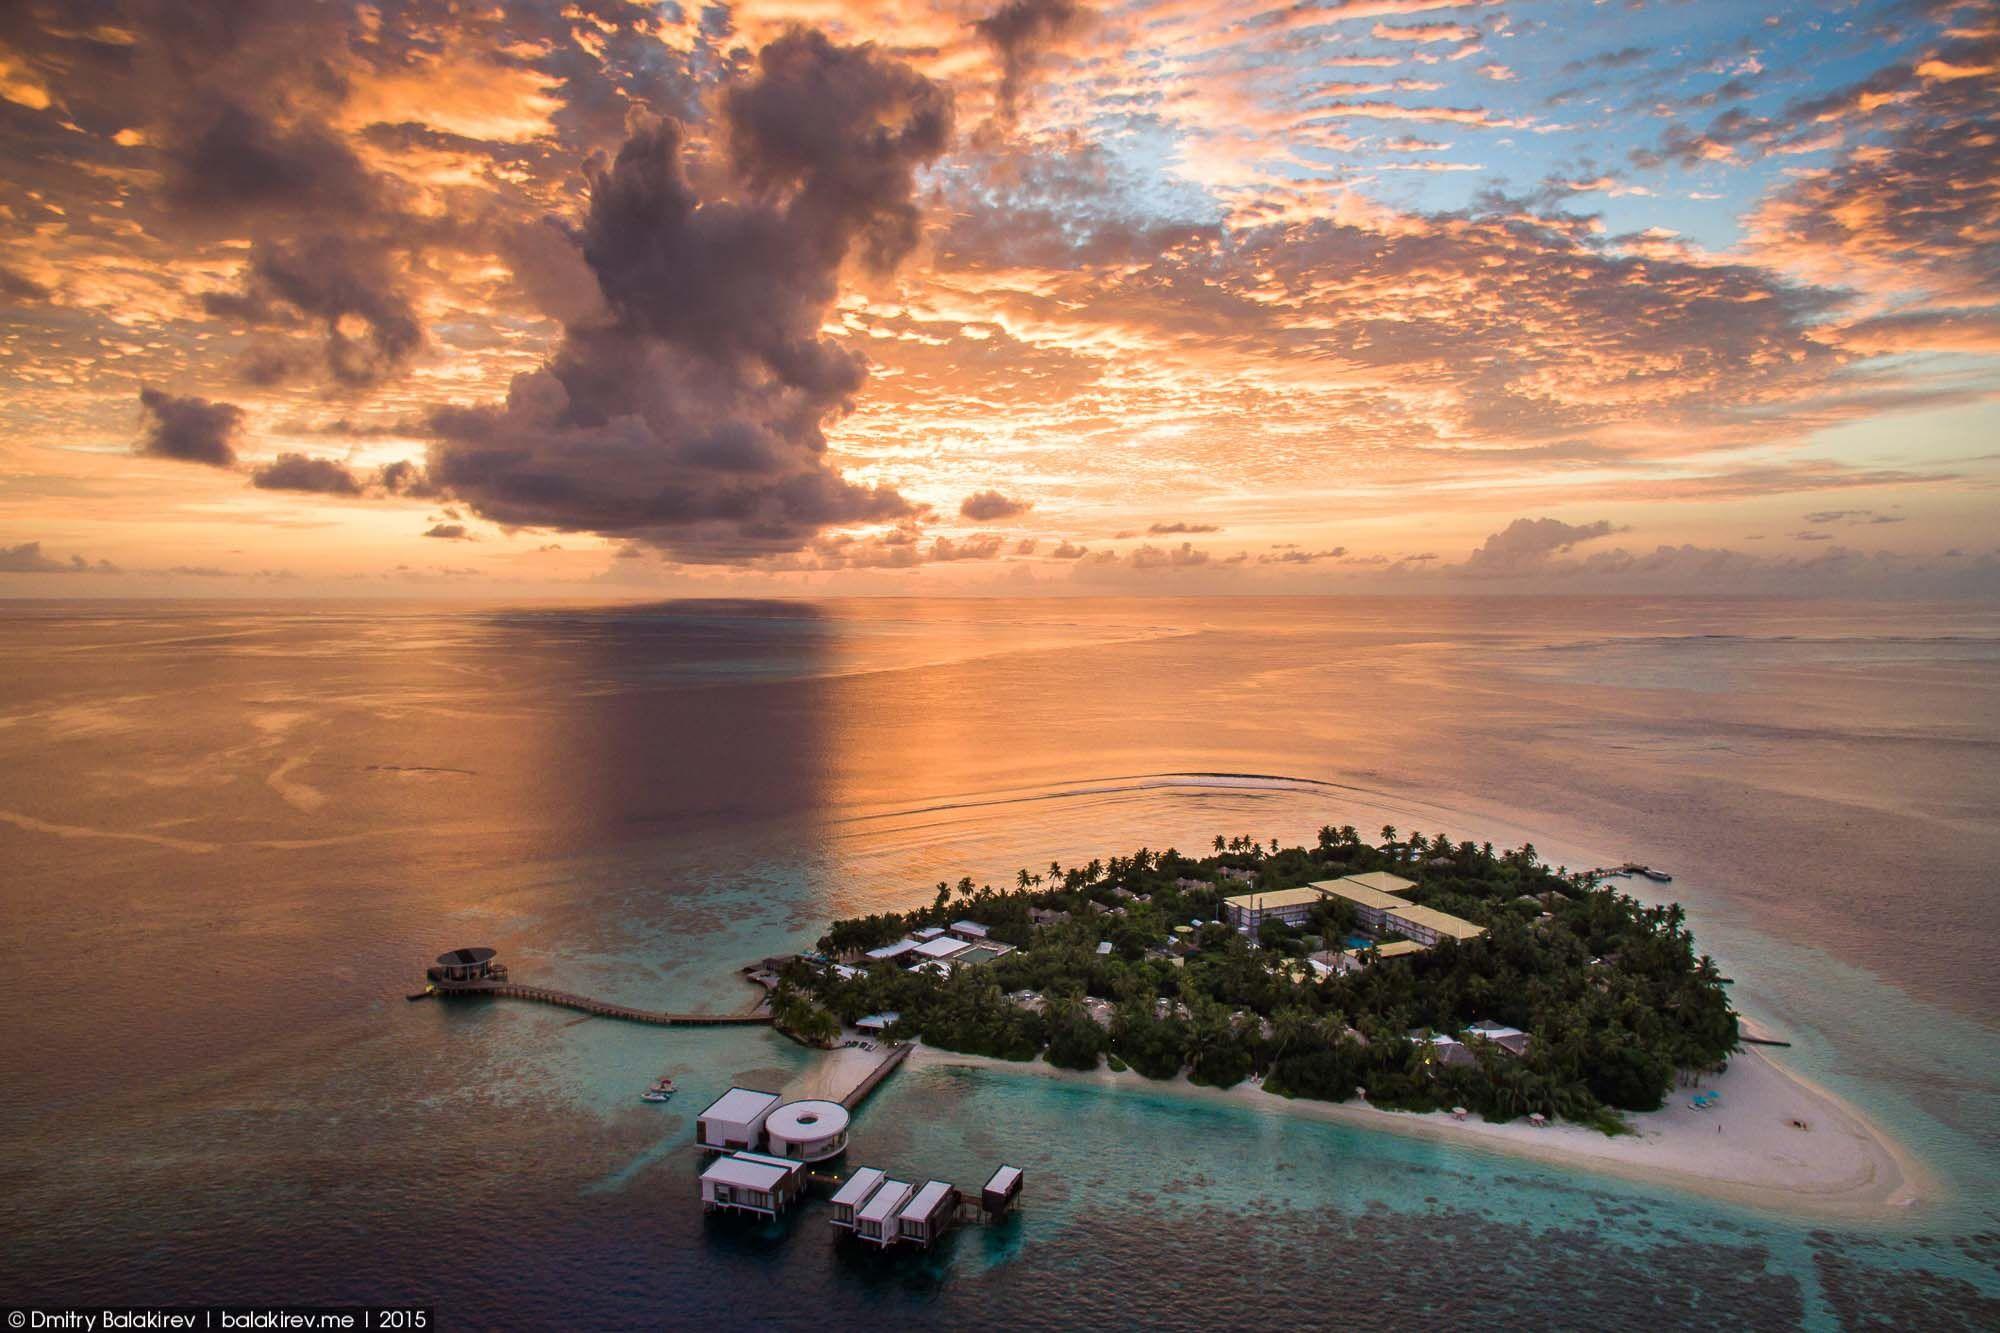 фото остров в виде сердца гифок